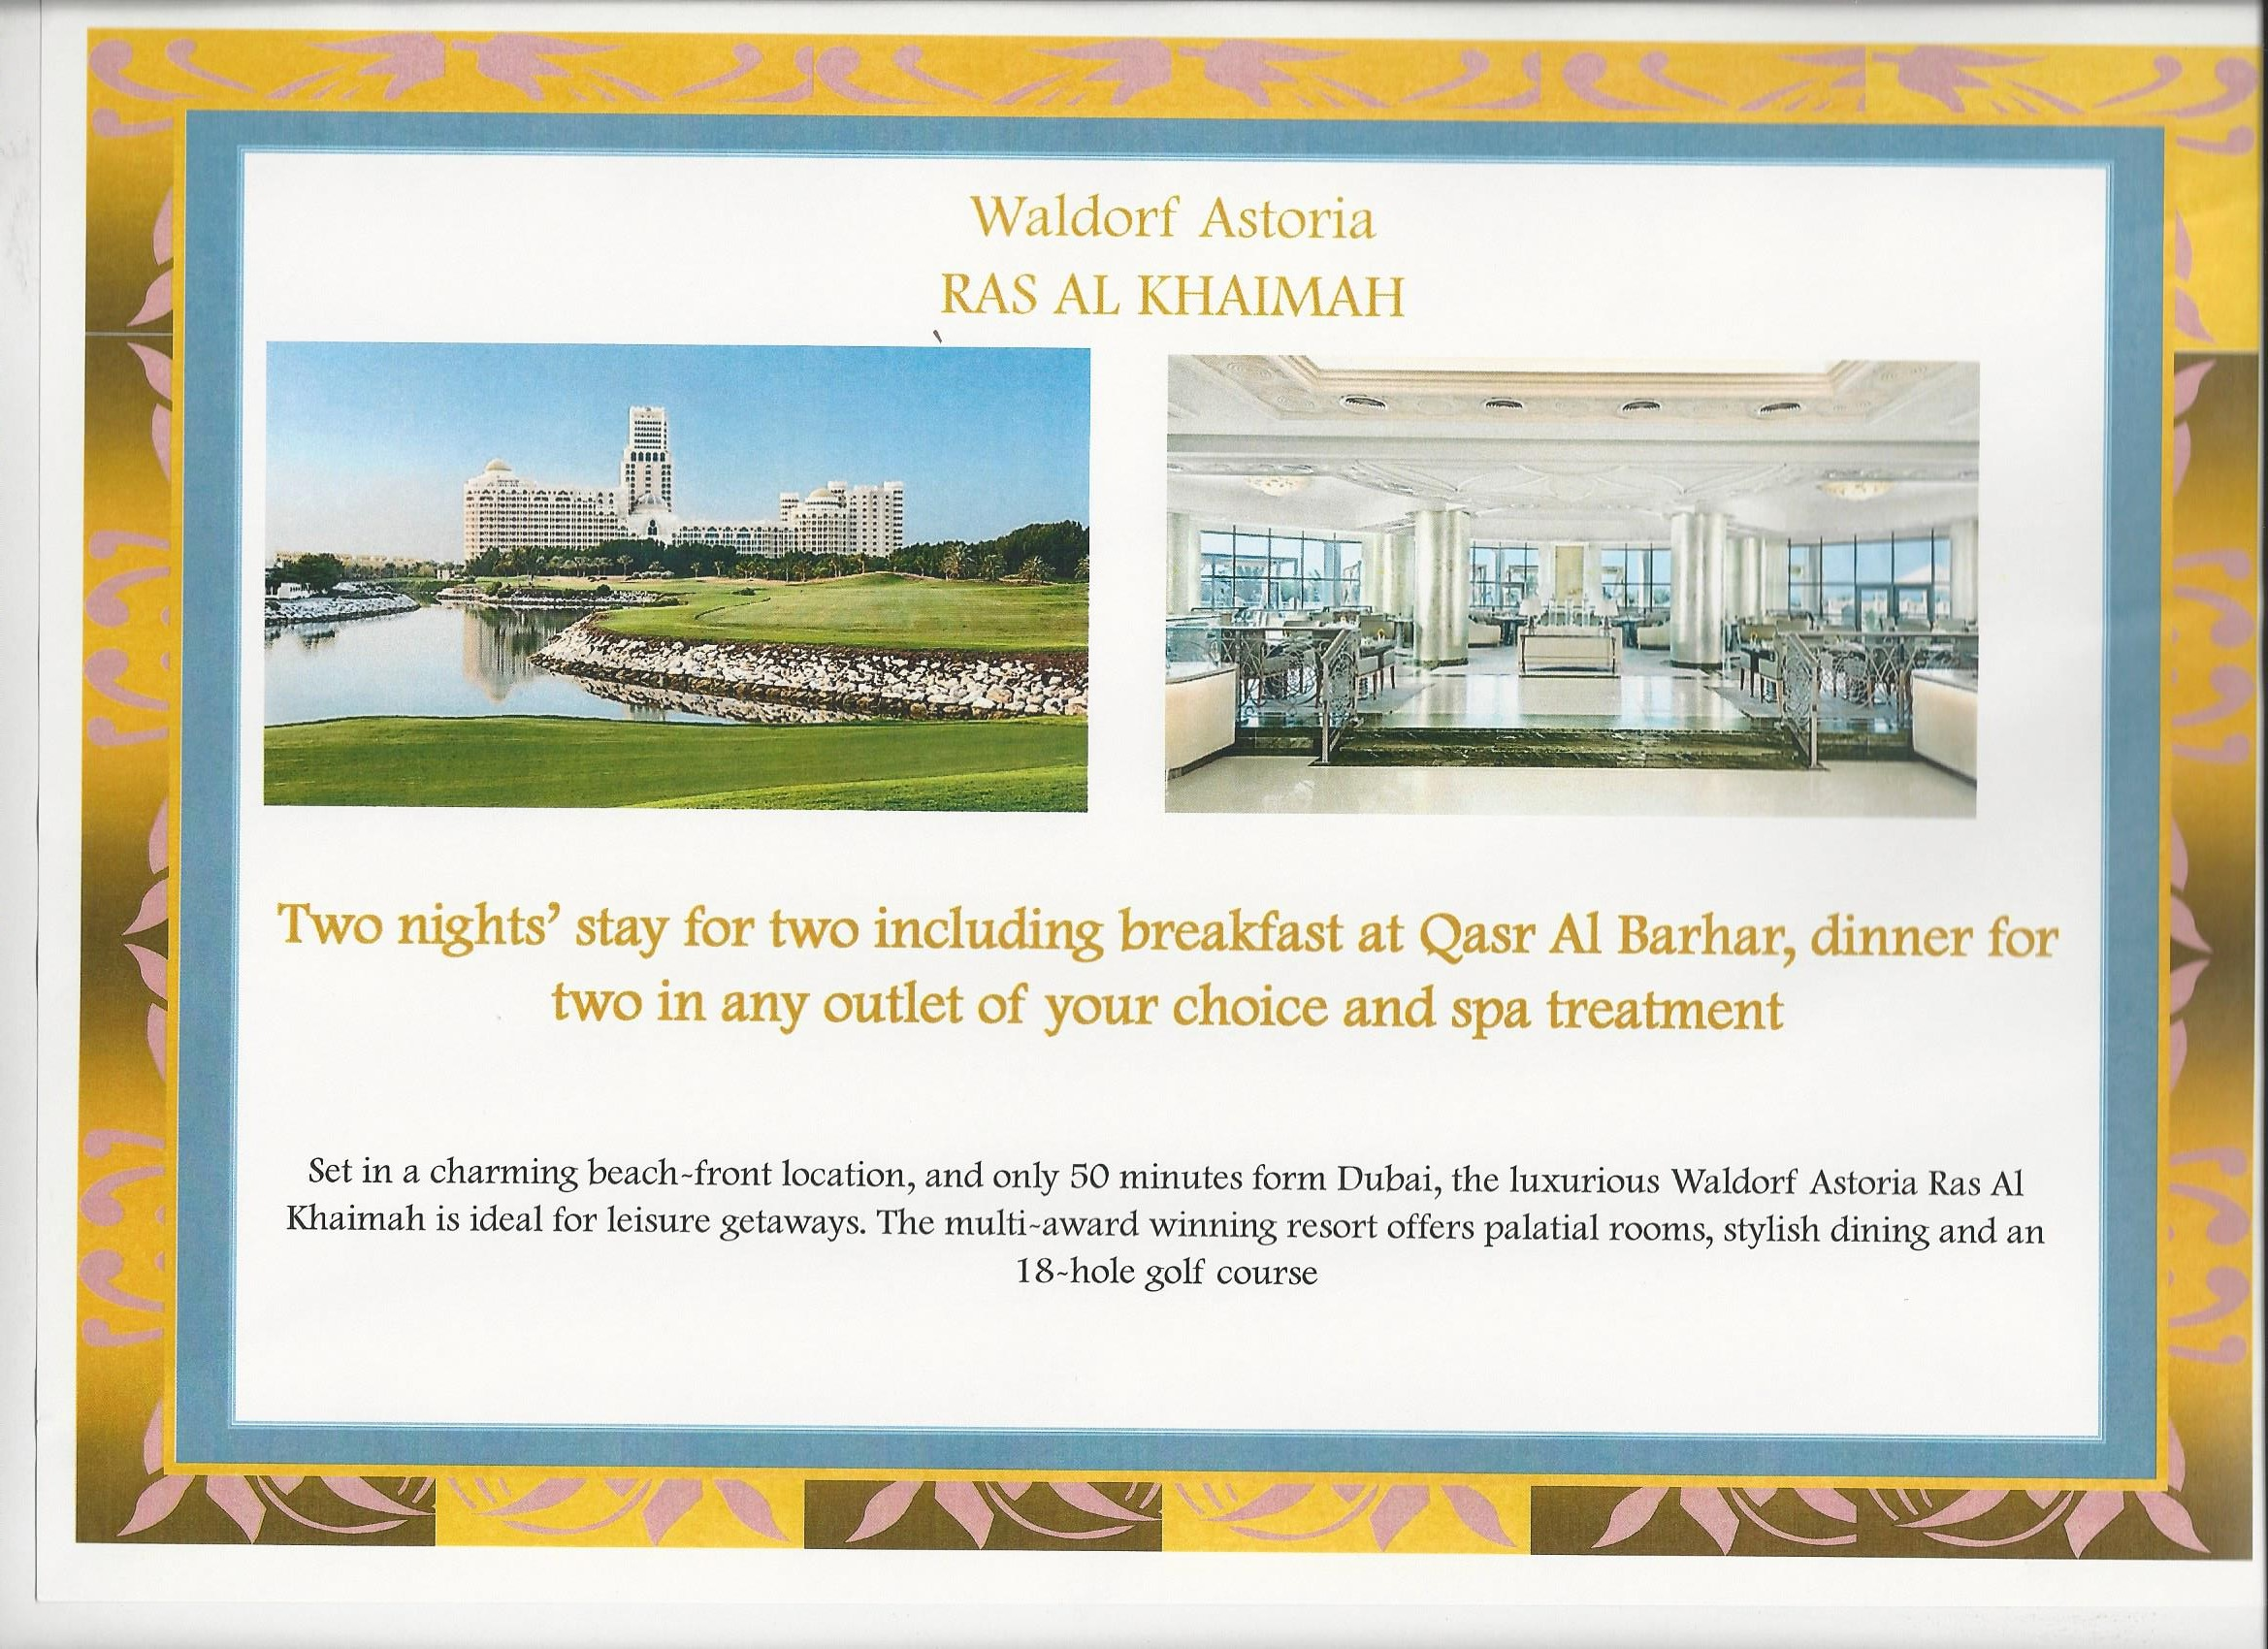 Waldorf Astoria Ras Al Khaimah, UAE